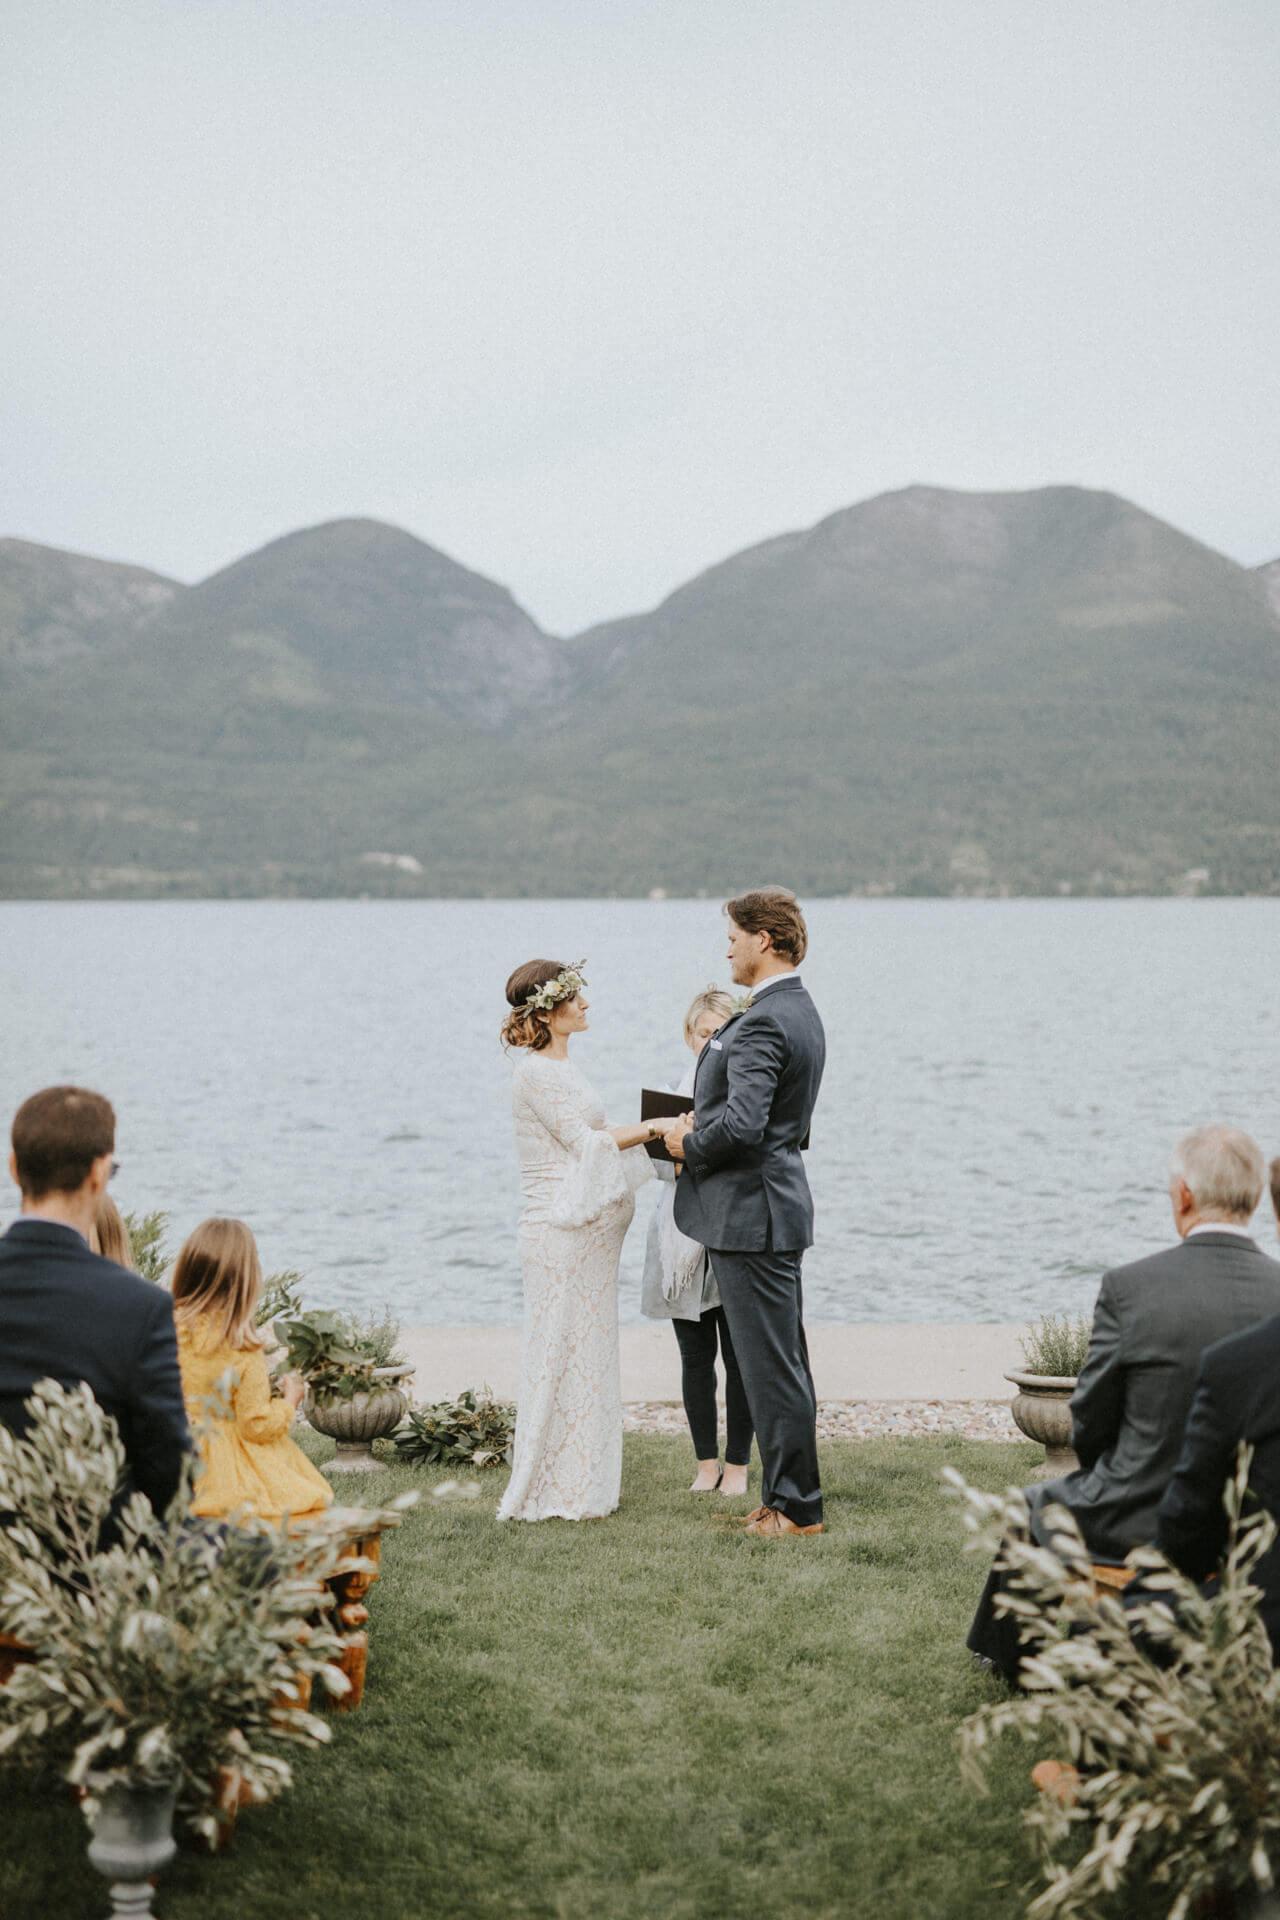 Central Iowa Wedding Photographers | Cluney Photography